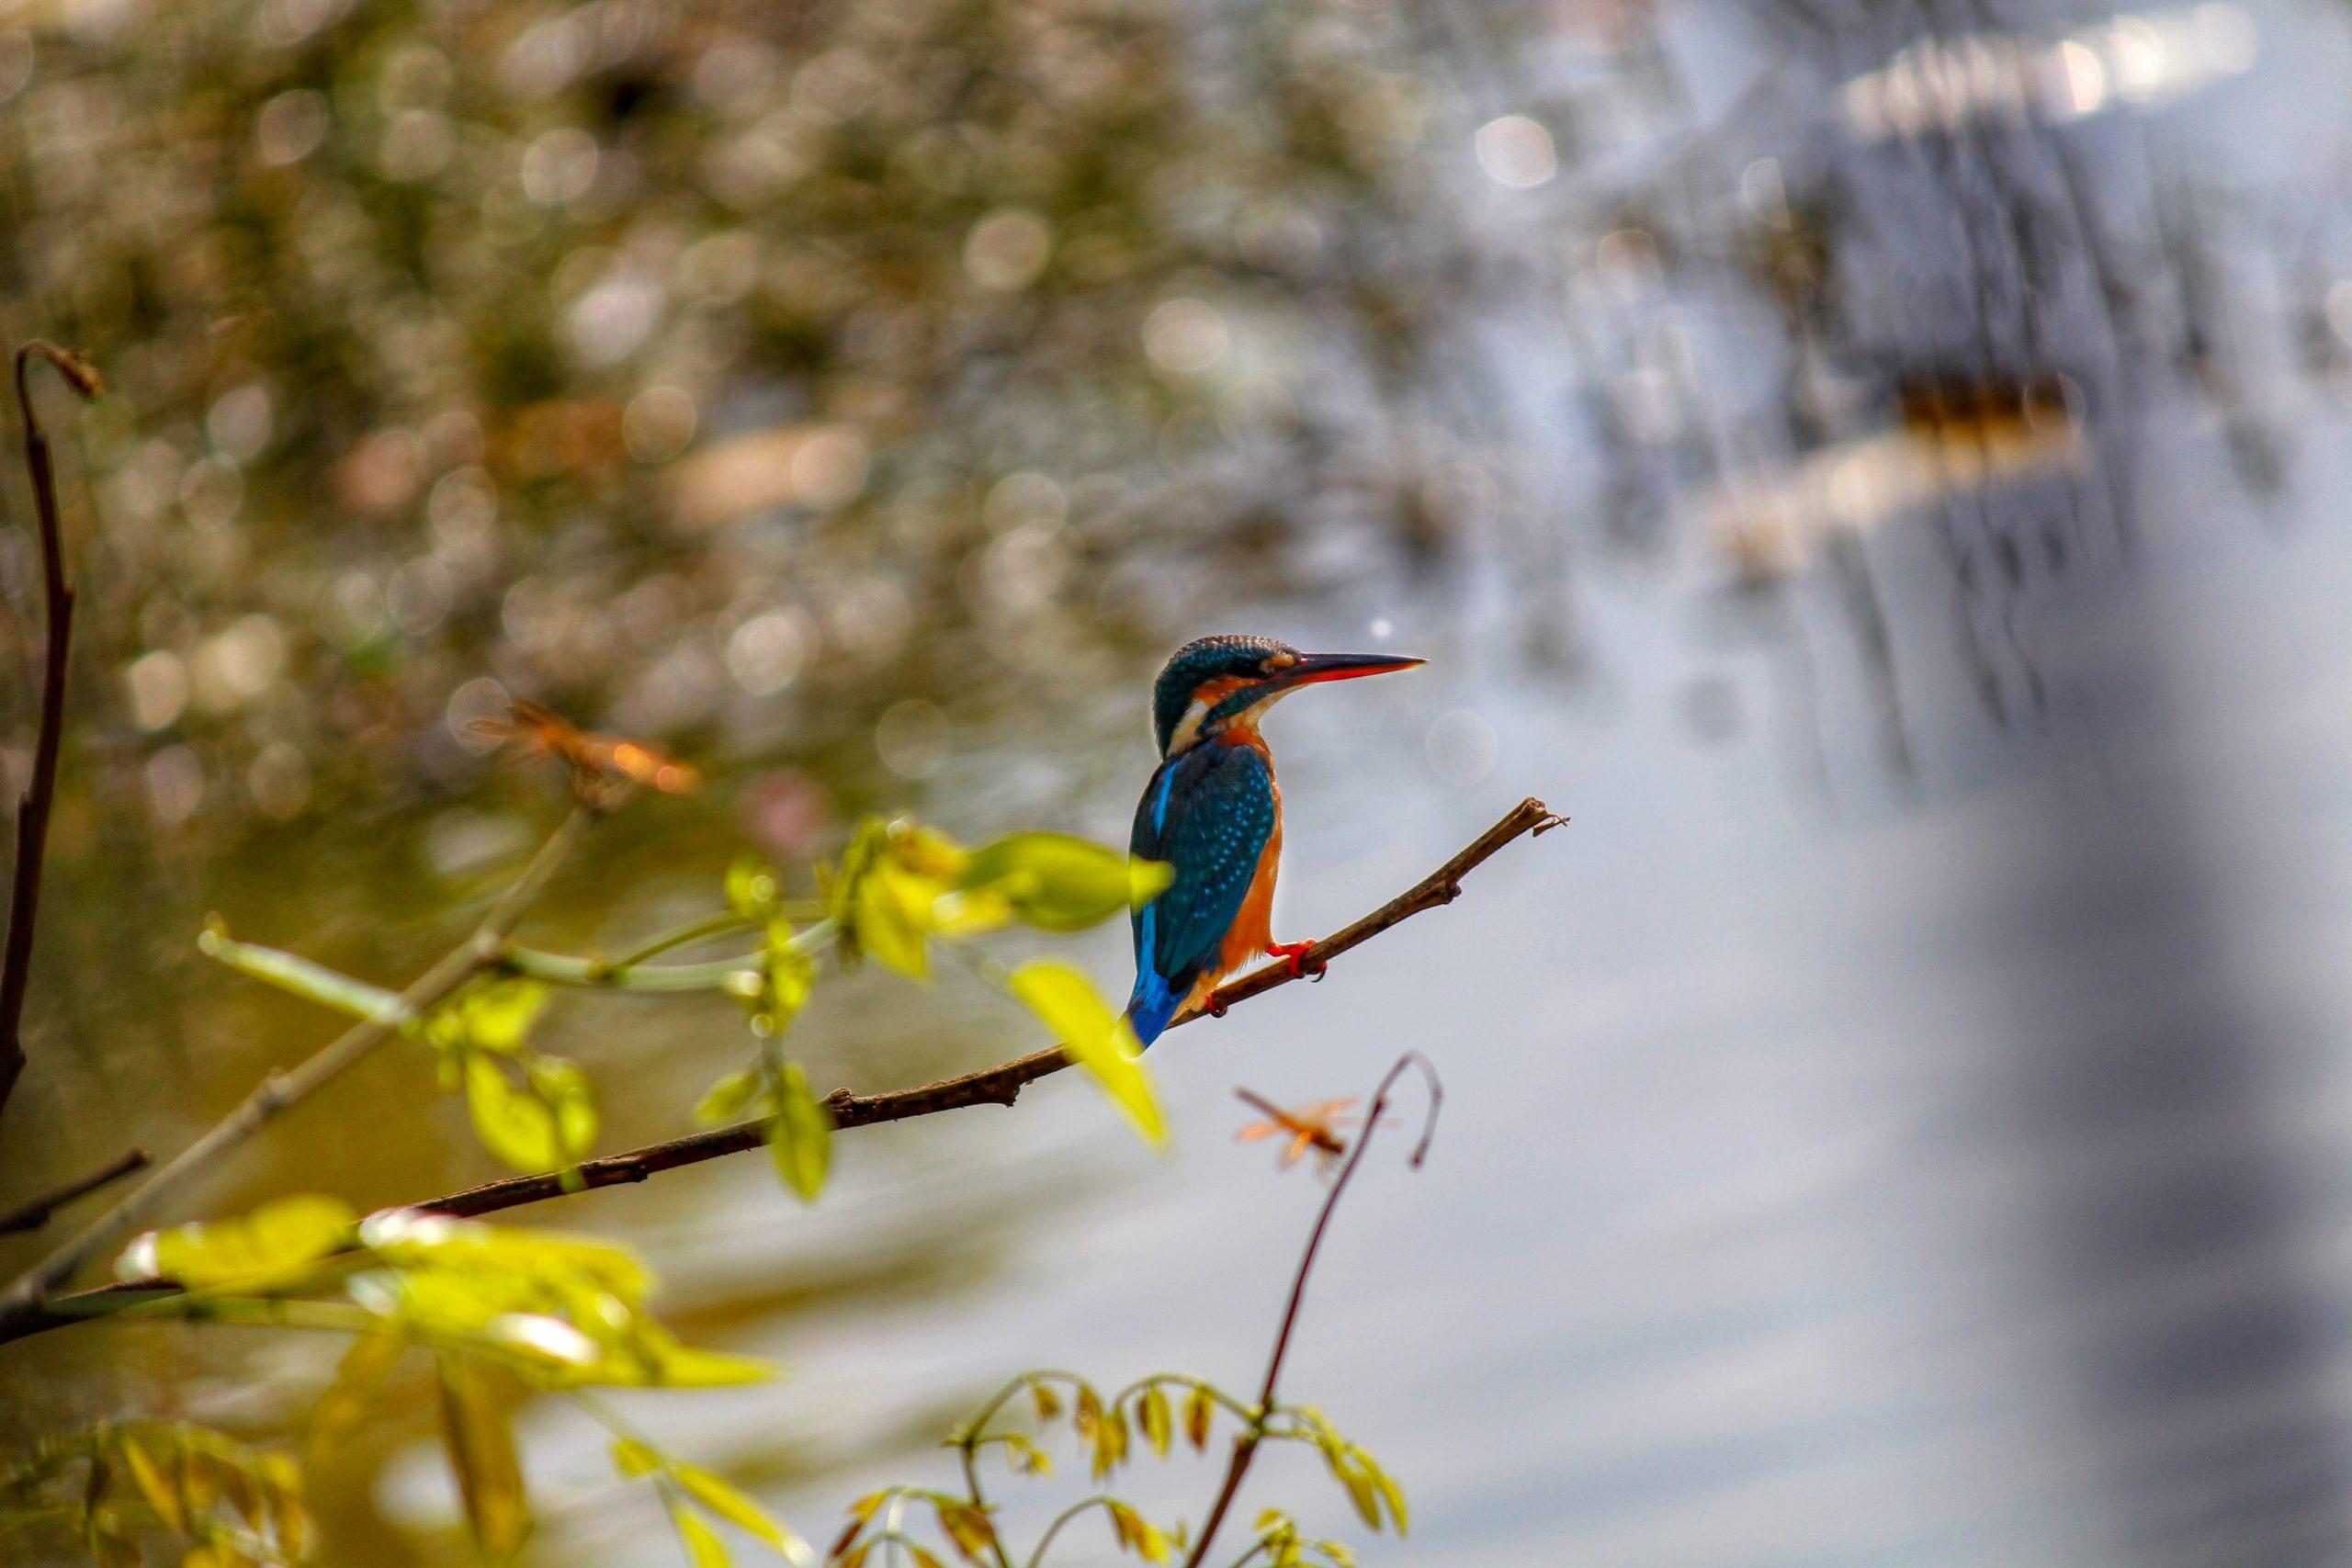 Kingfisher sitting on tree